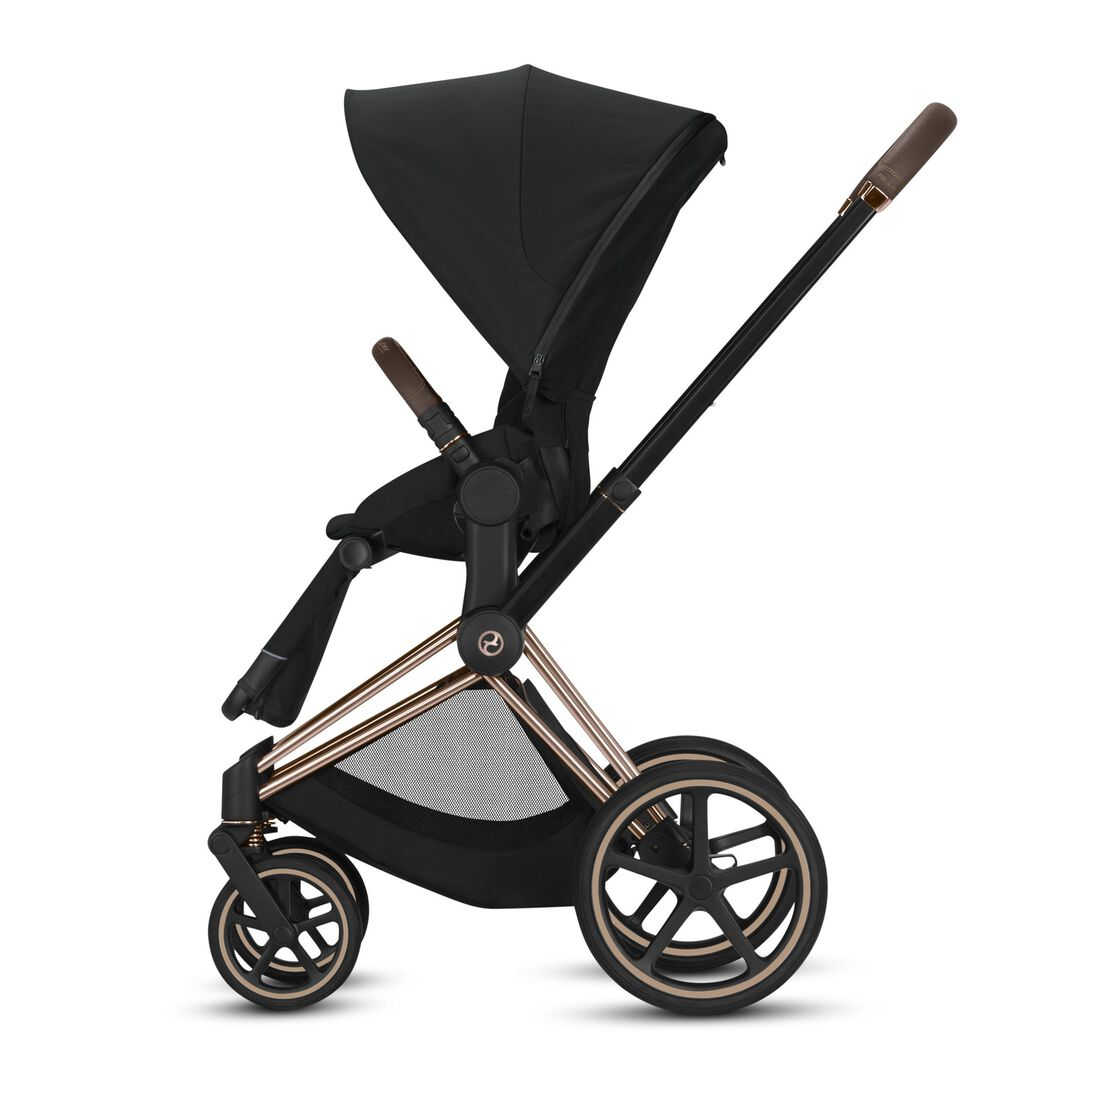 CYBEX TALOS S Lux - Black Frame - Puncture-proof all-terrain wheels